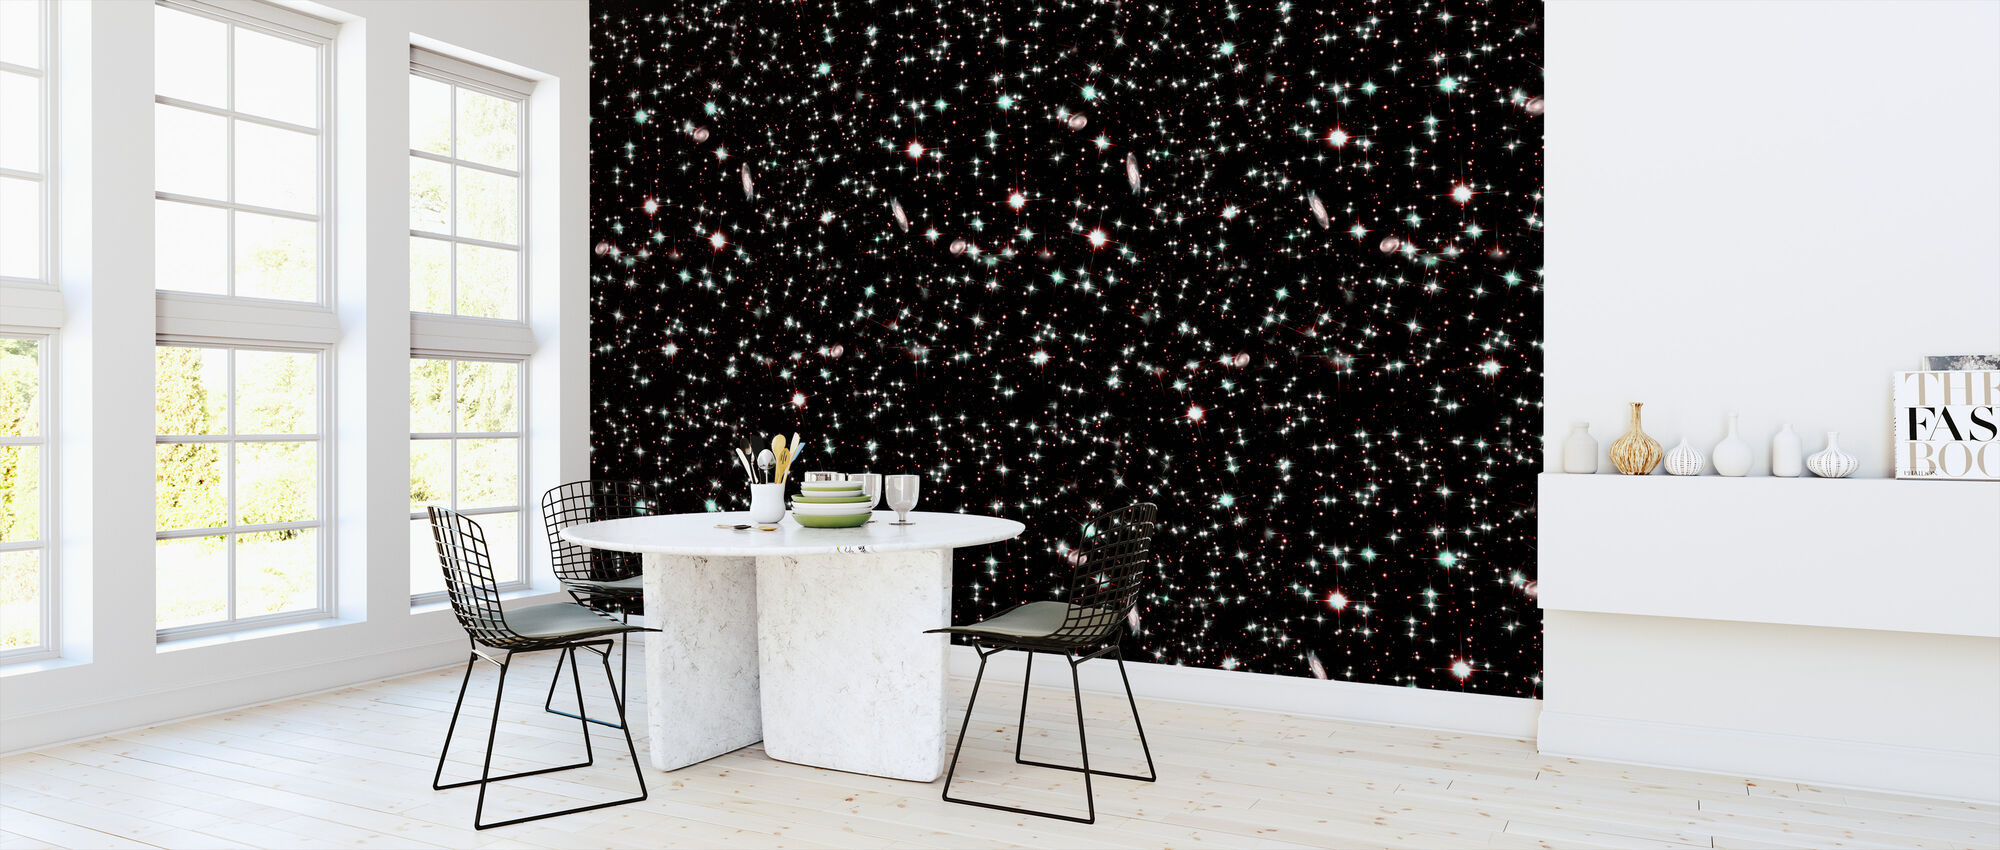 Sparkles - Wallpaper - Kitchen